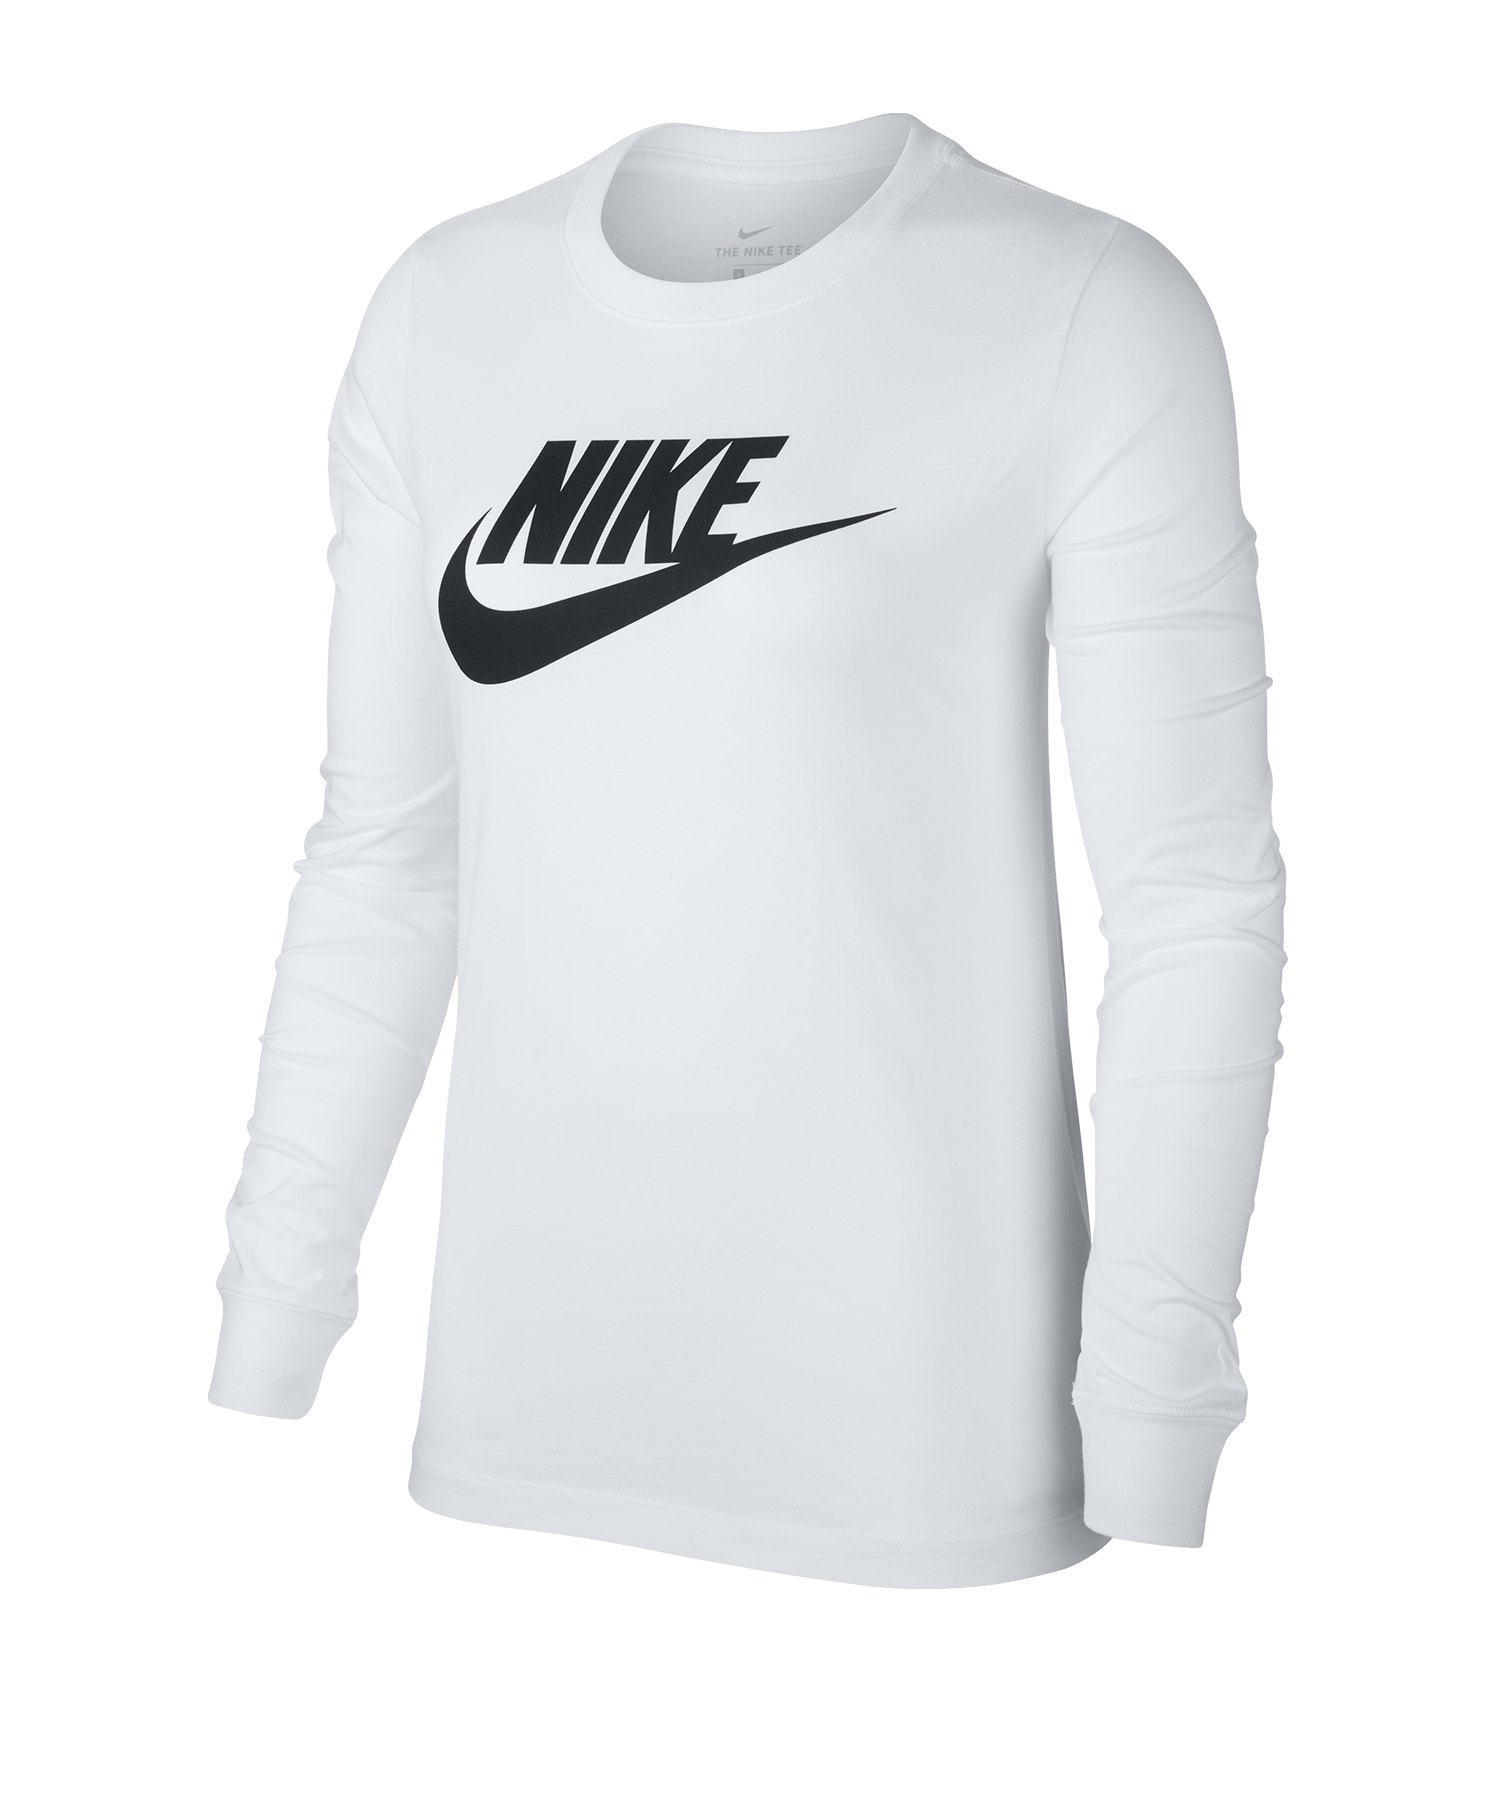 Nike Essential Sweatshirt Damen Weiss F100 - weiss